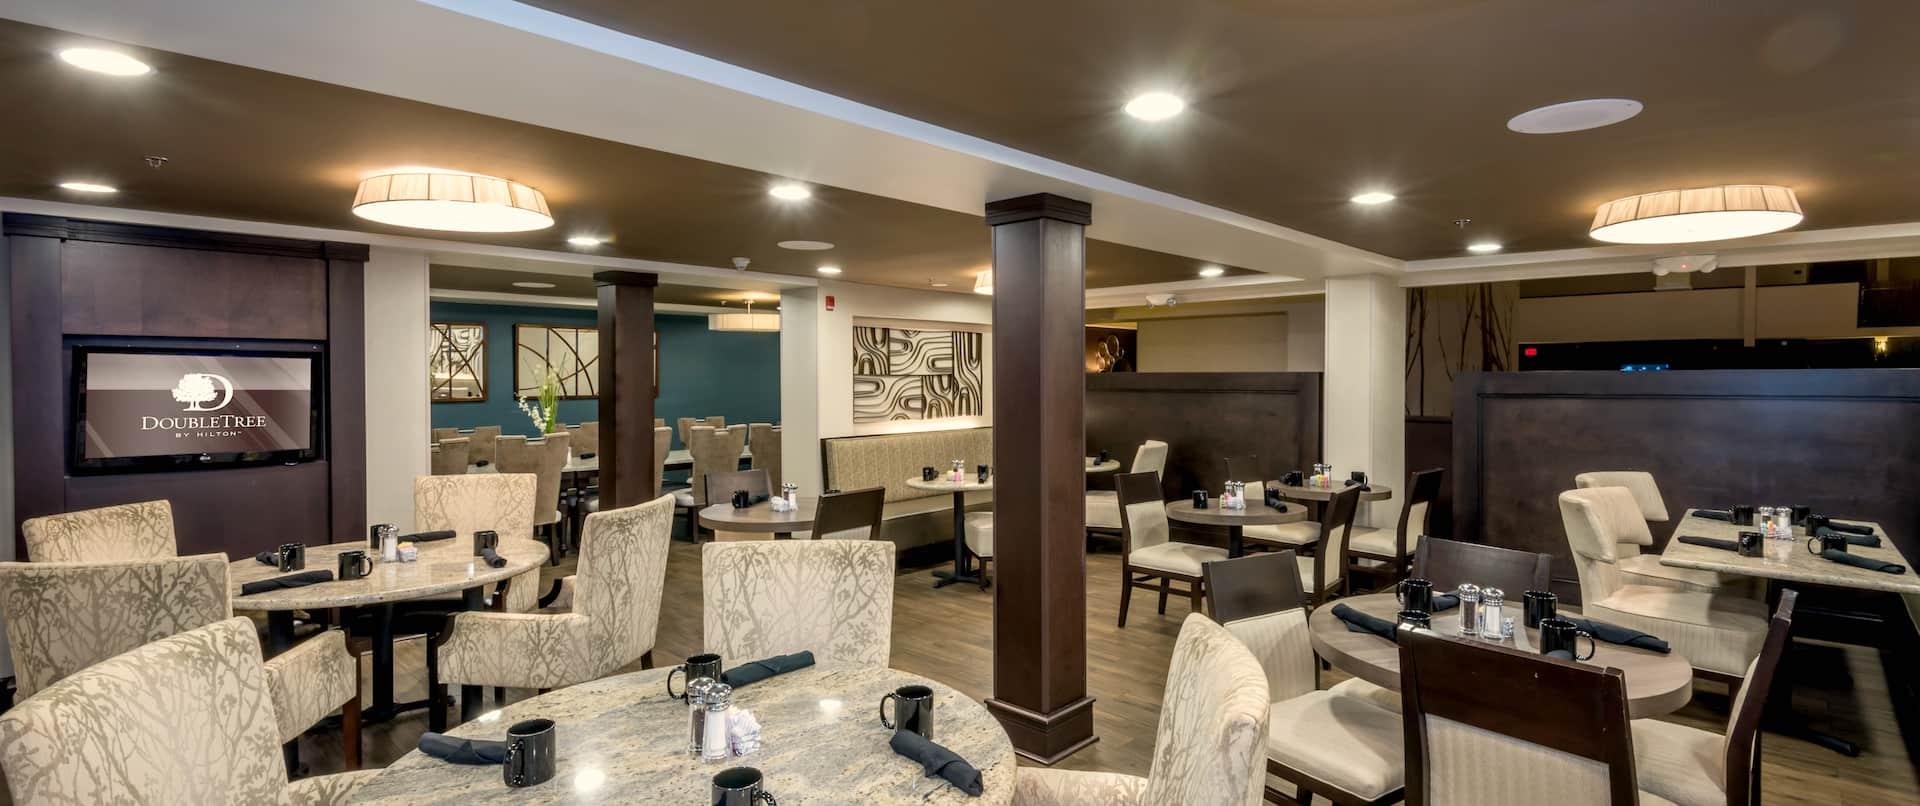 One2Zero Restaurant Seating